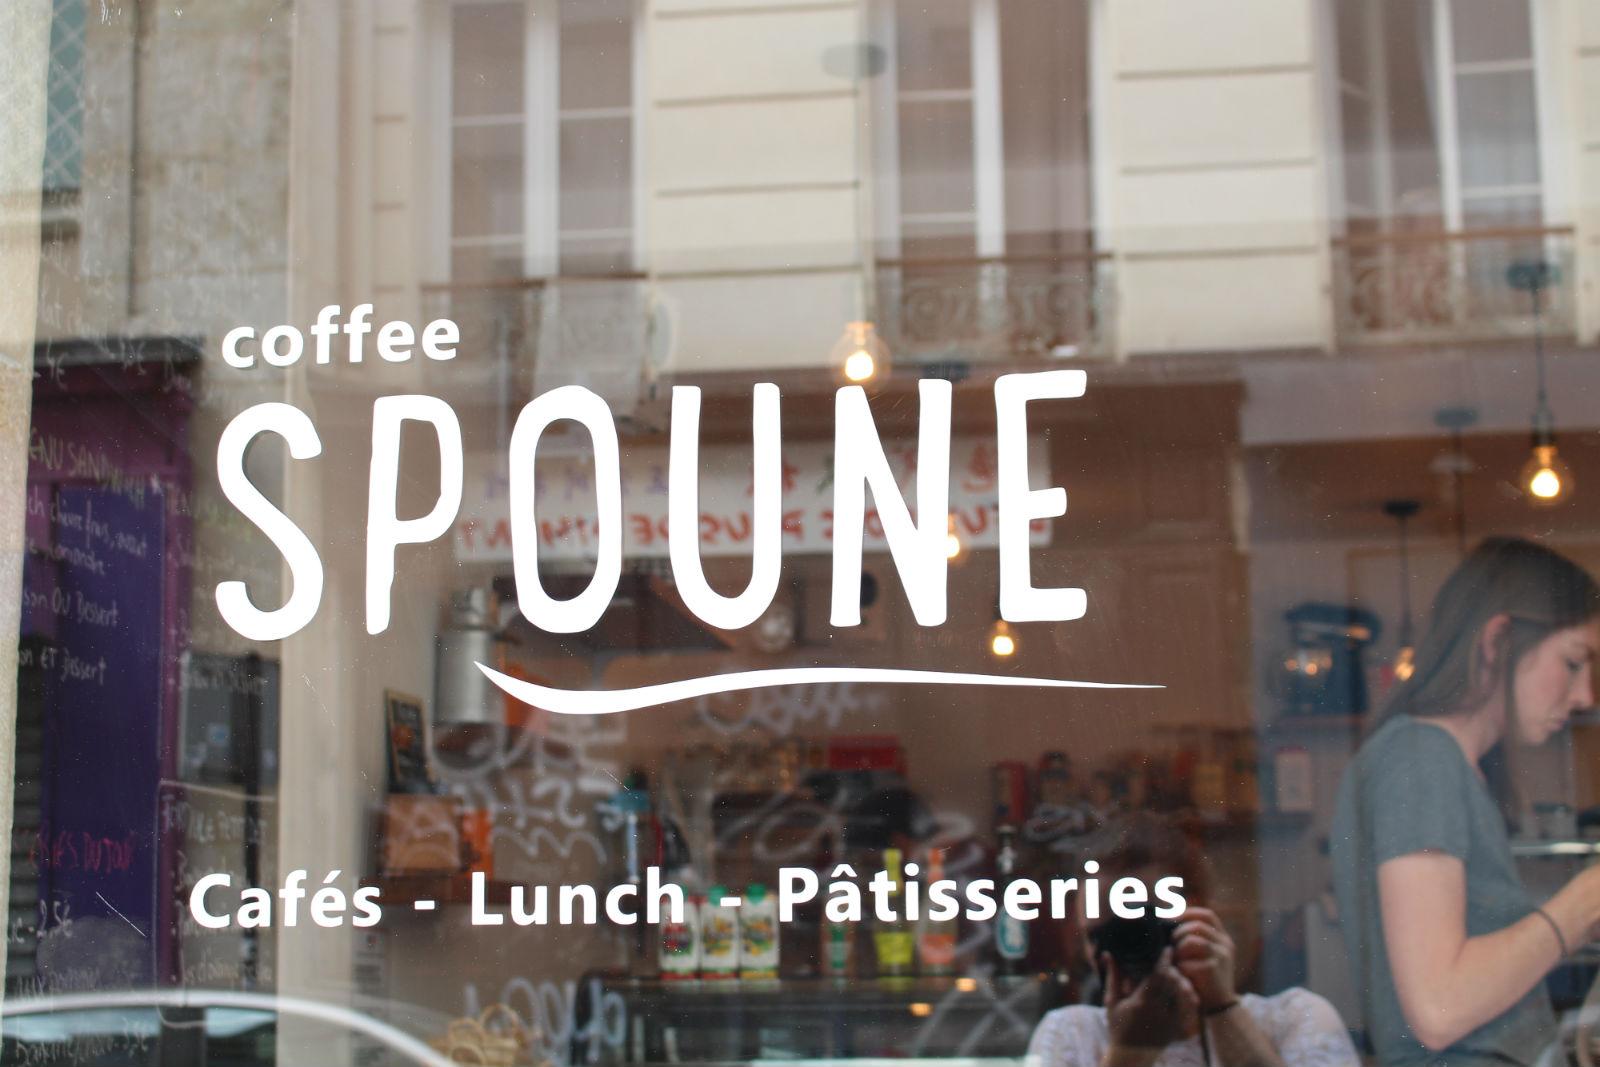 HiP Paris blog. Coffee Spoune. Looking in the window.